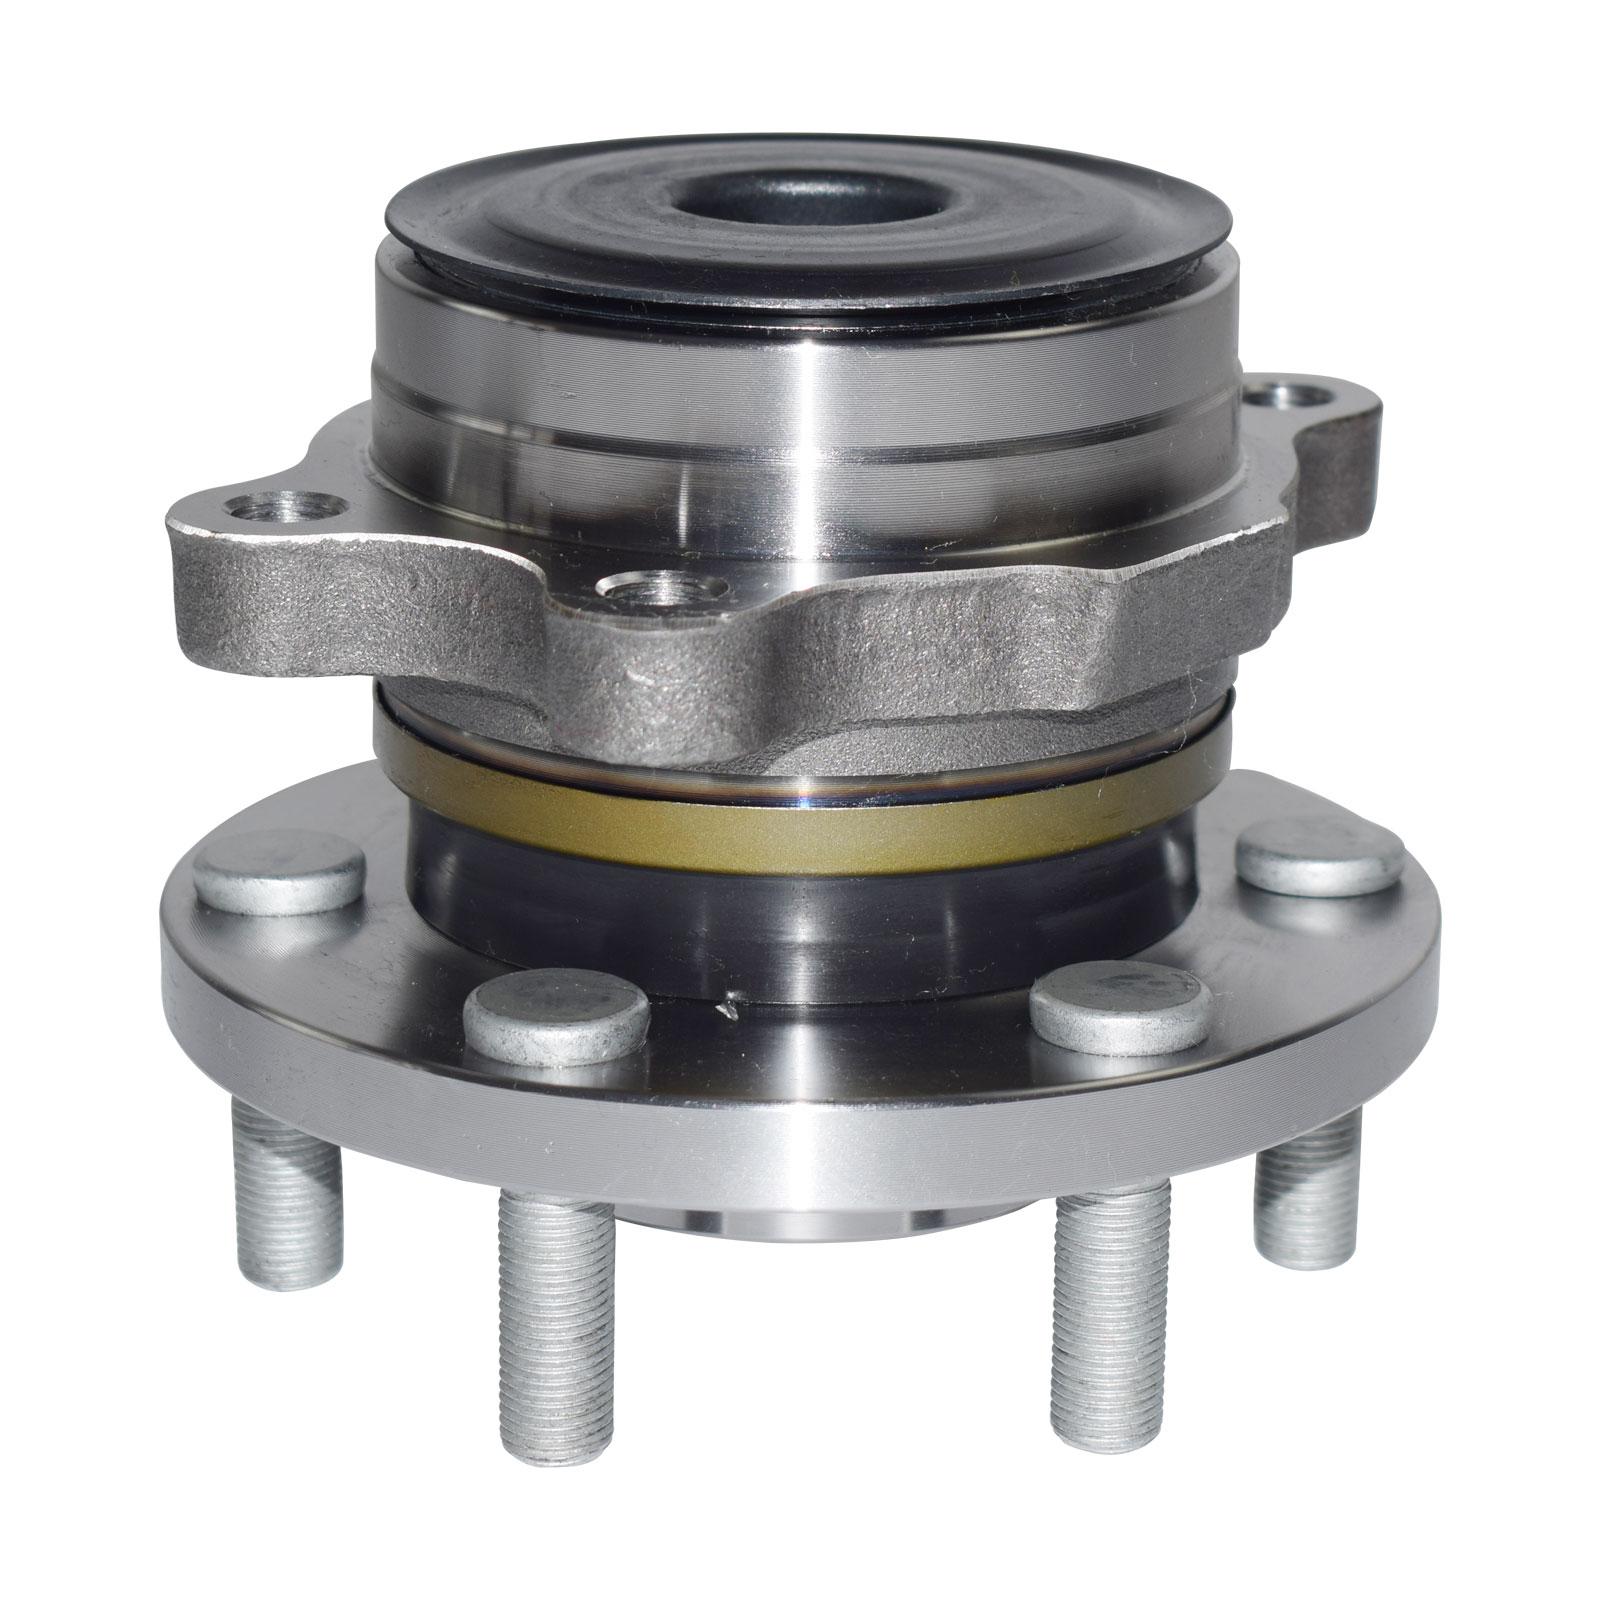 Wheel Bearing Kits & Hub - Free Wheeling Hub - Machter Autoparts